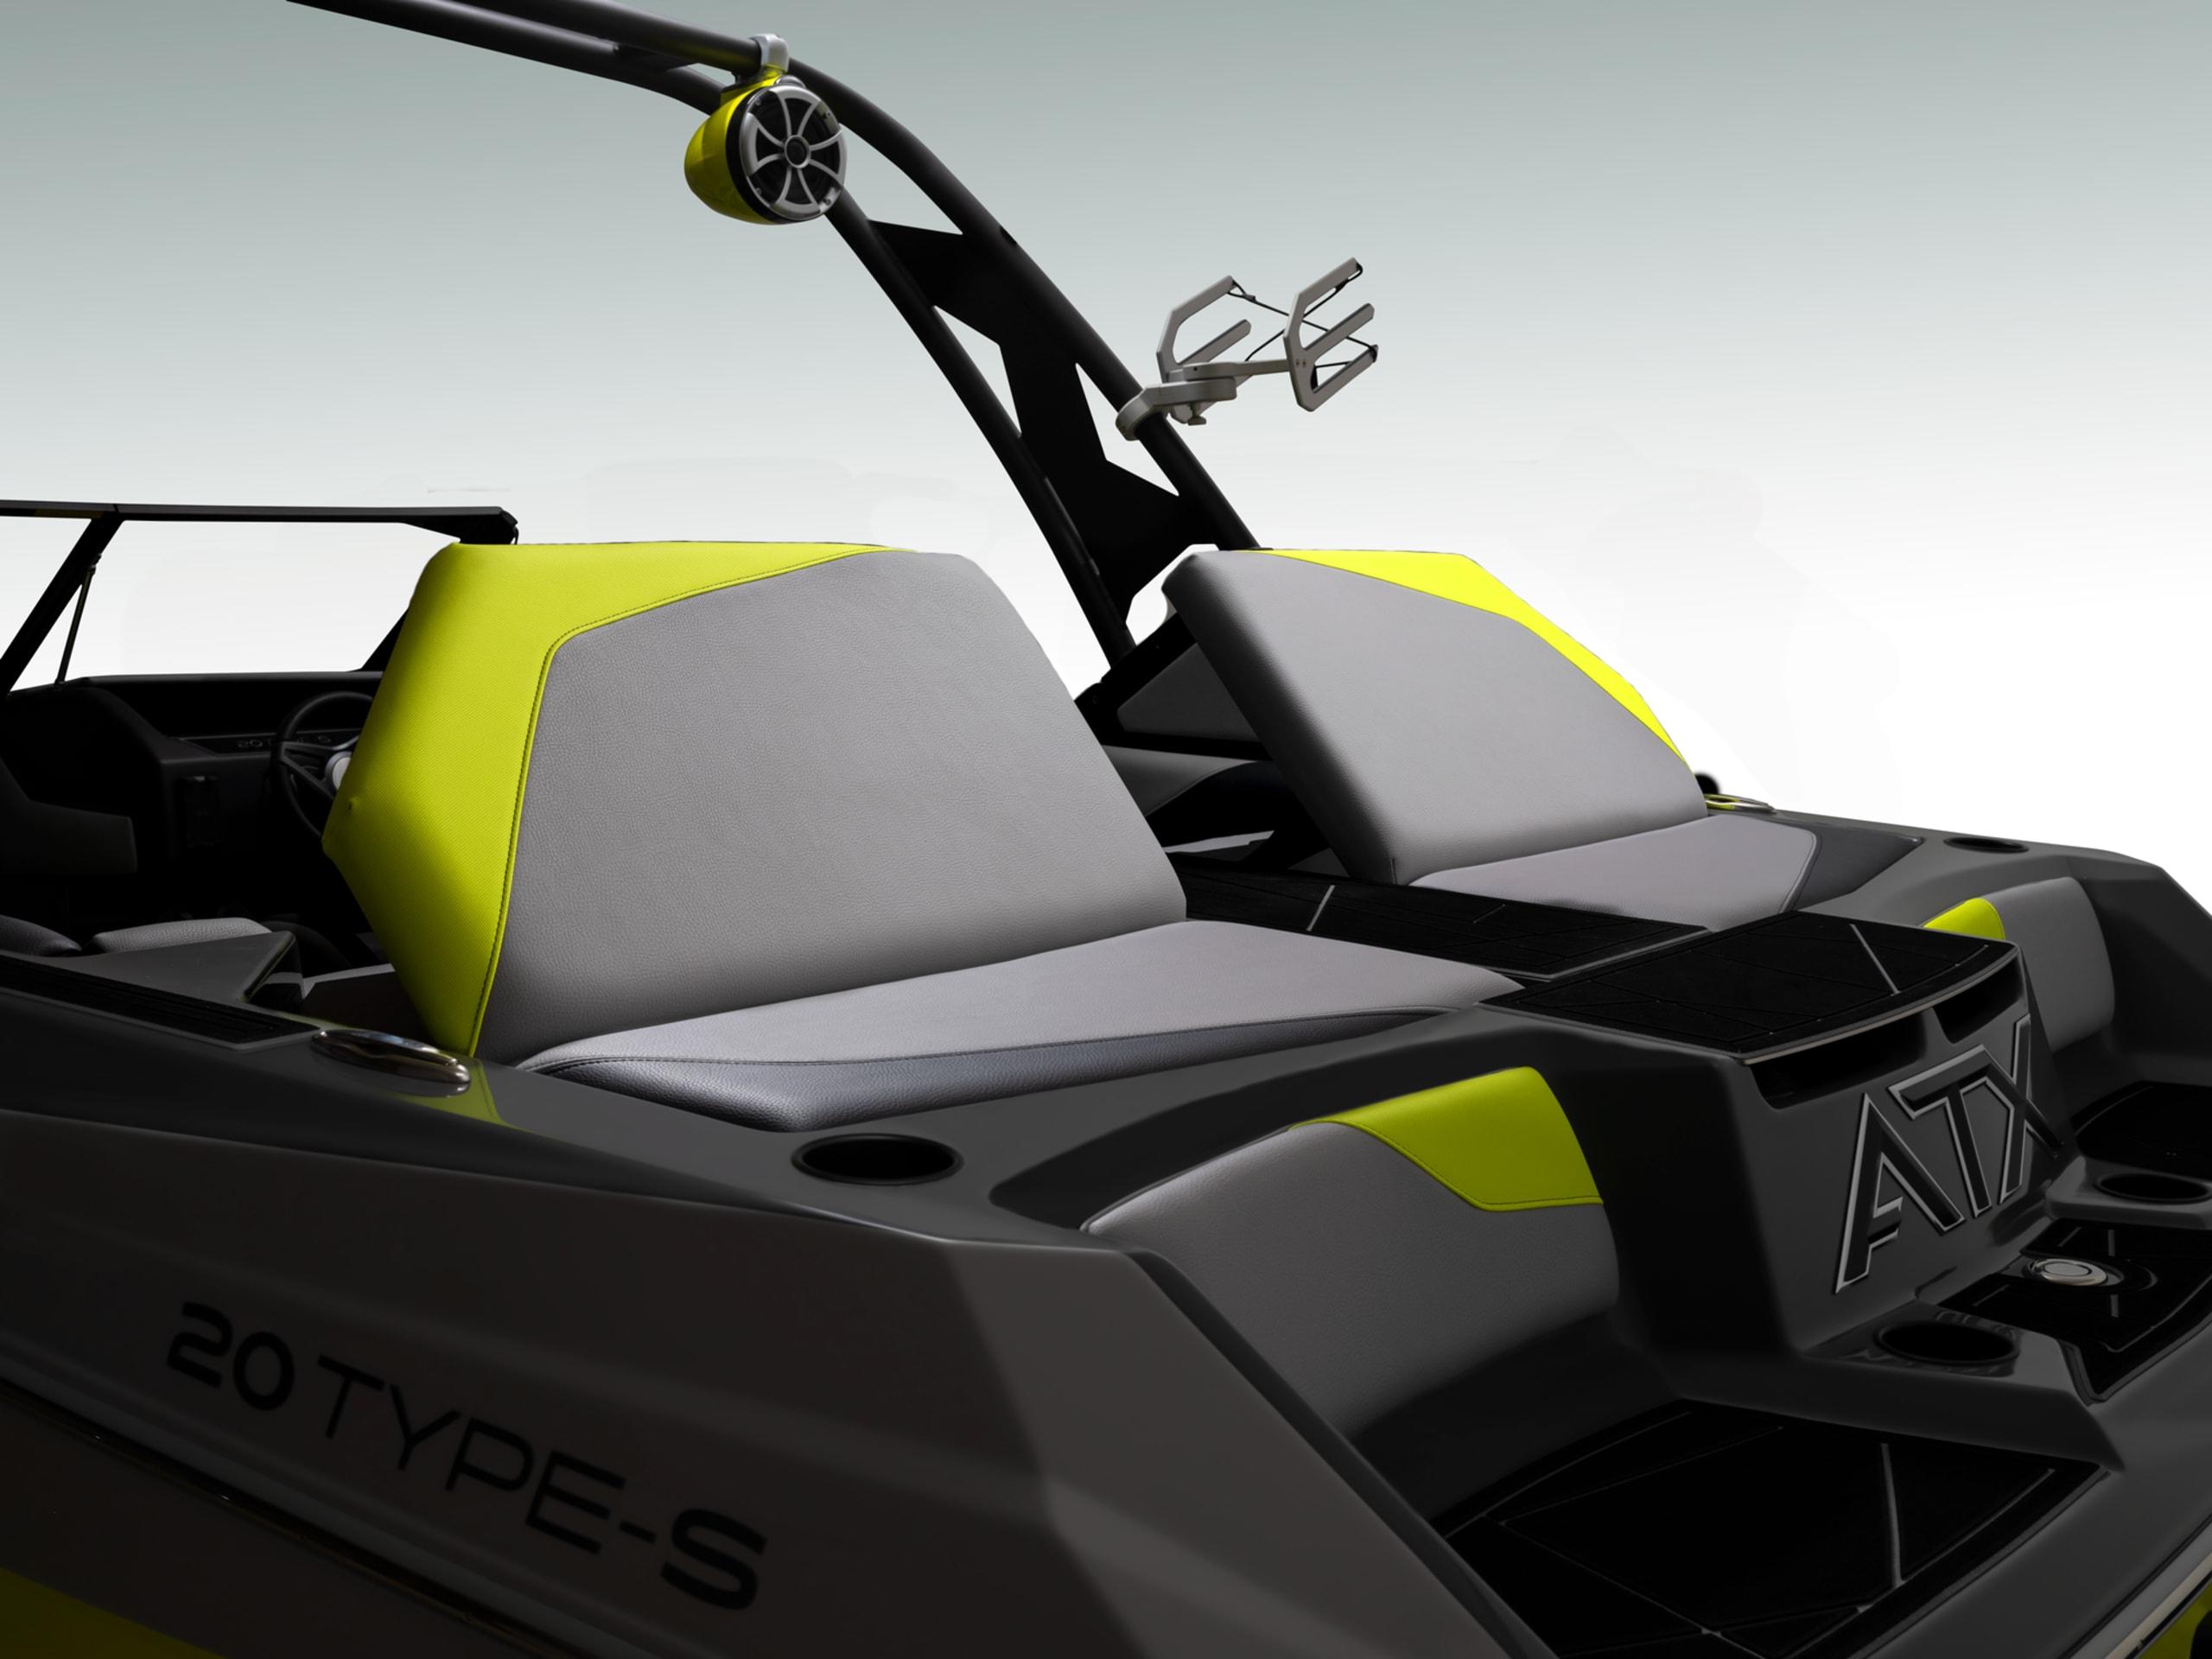 FINAL2021 ATX20 Type S 2021 ATX Boats Bradlee Rutledge 3355 v2 half flip